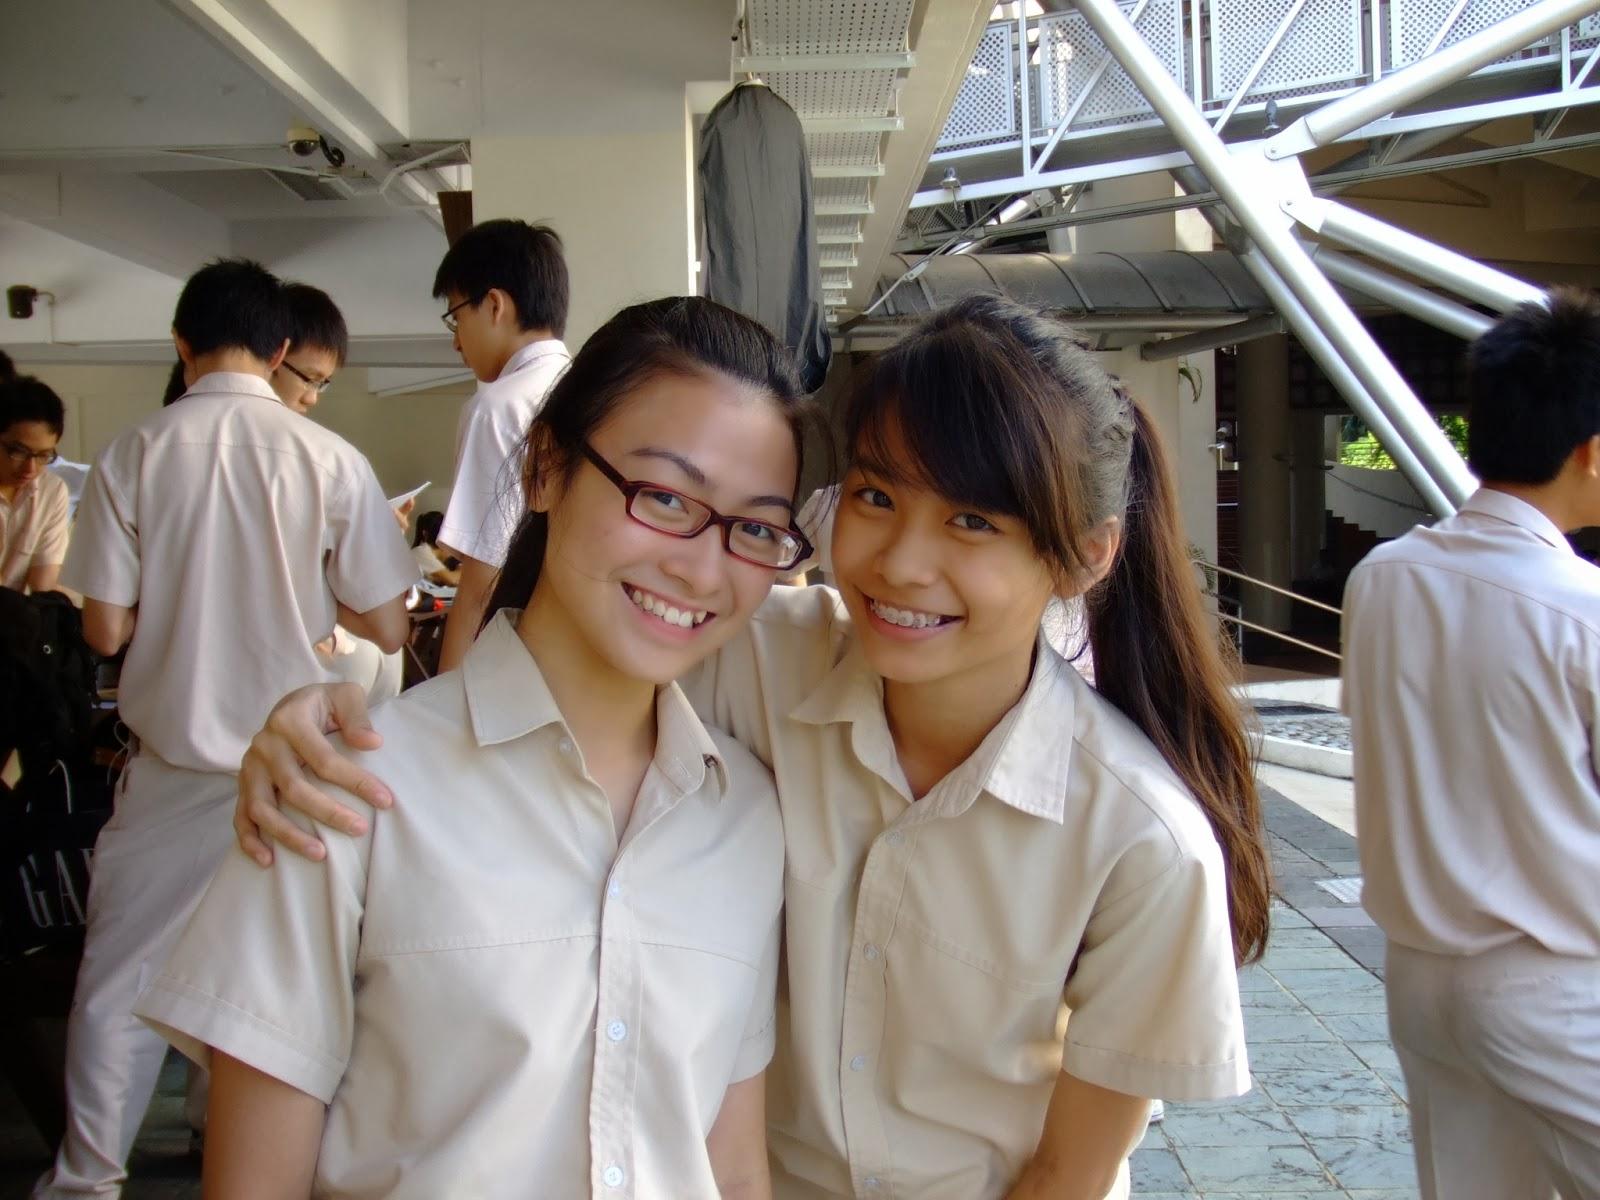 Hot upskirt at singapore poly - 4 3